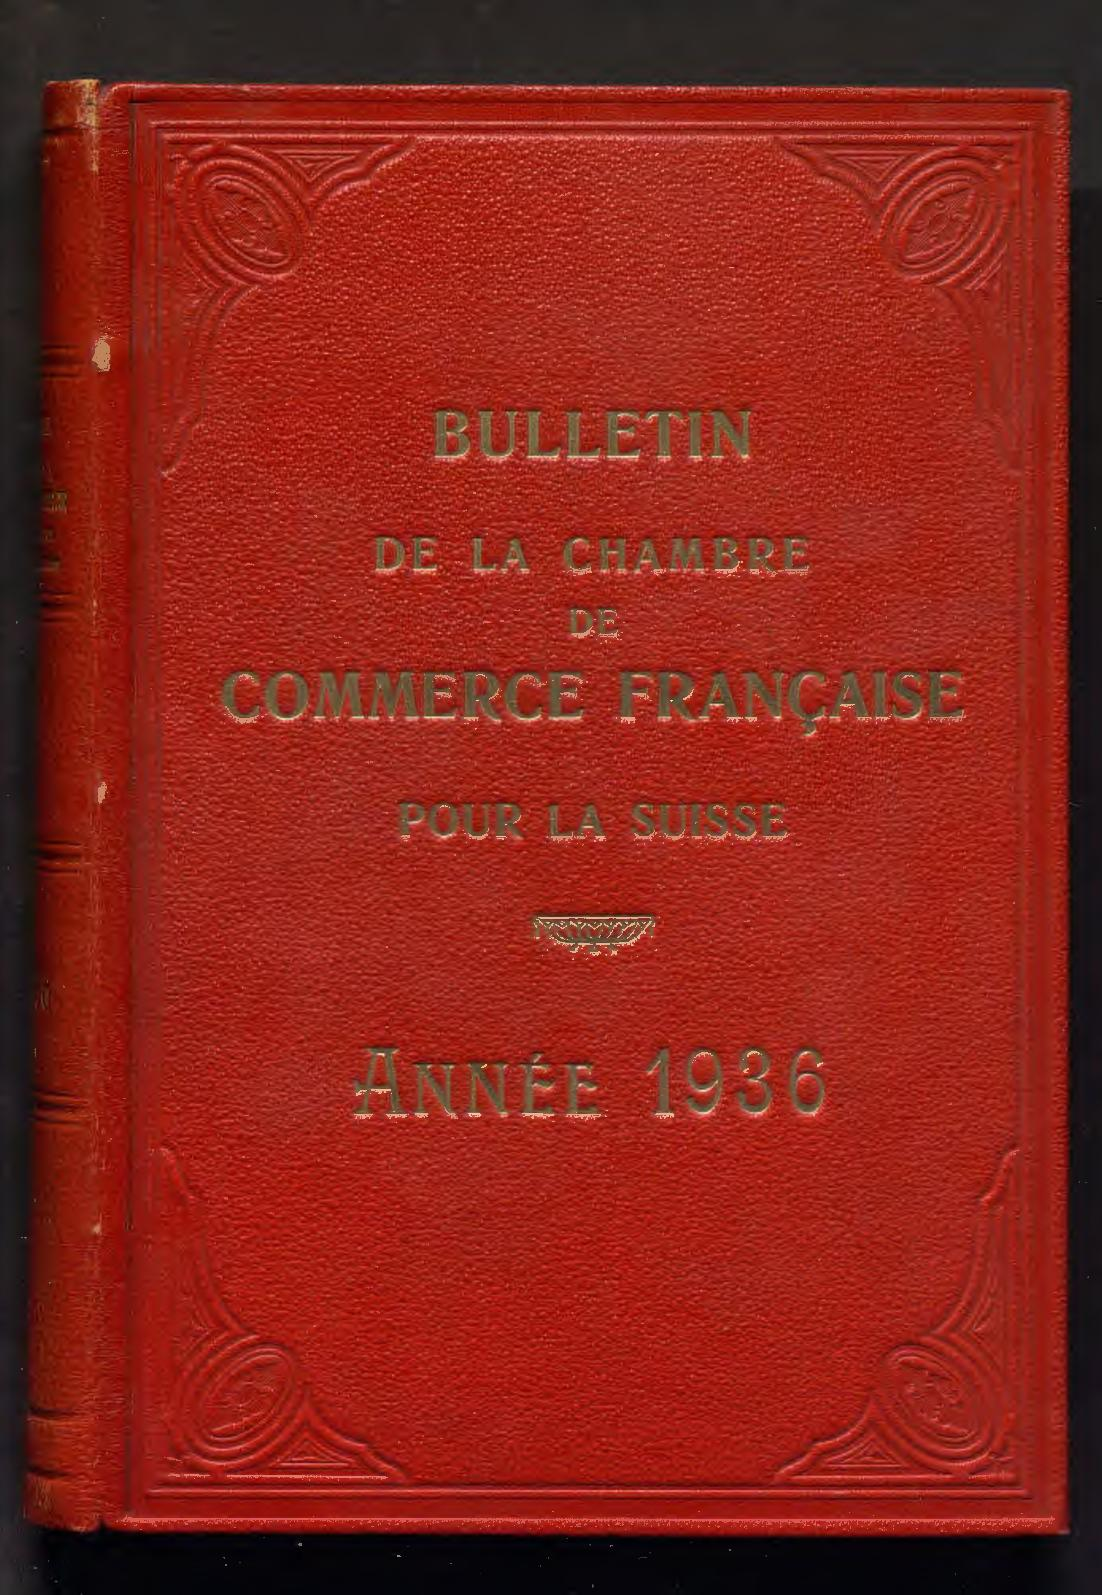 Mensuel Calaméo CCIFS Archives Bulletin 1936 De Nny0wvm8OP